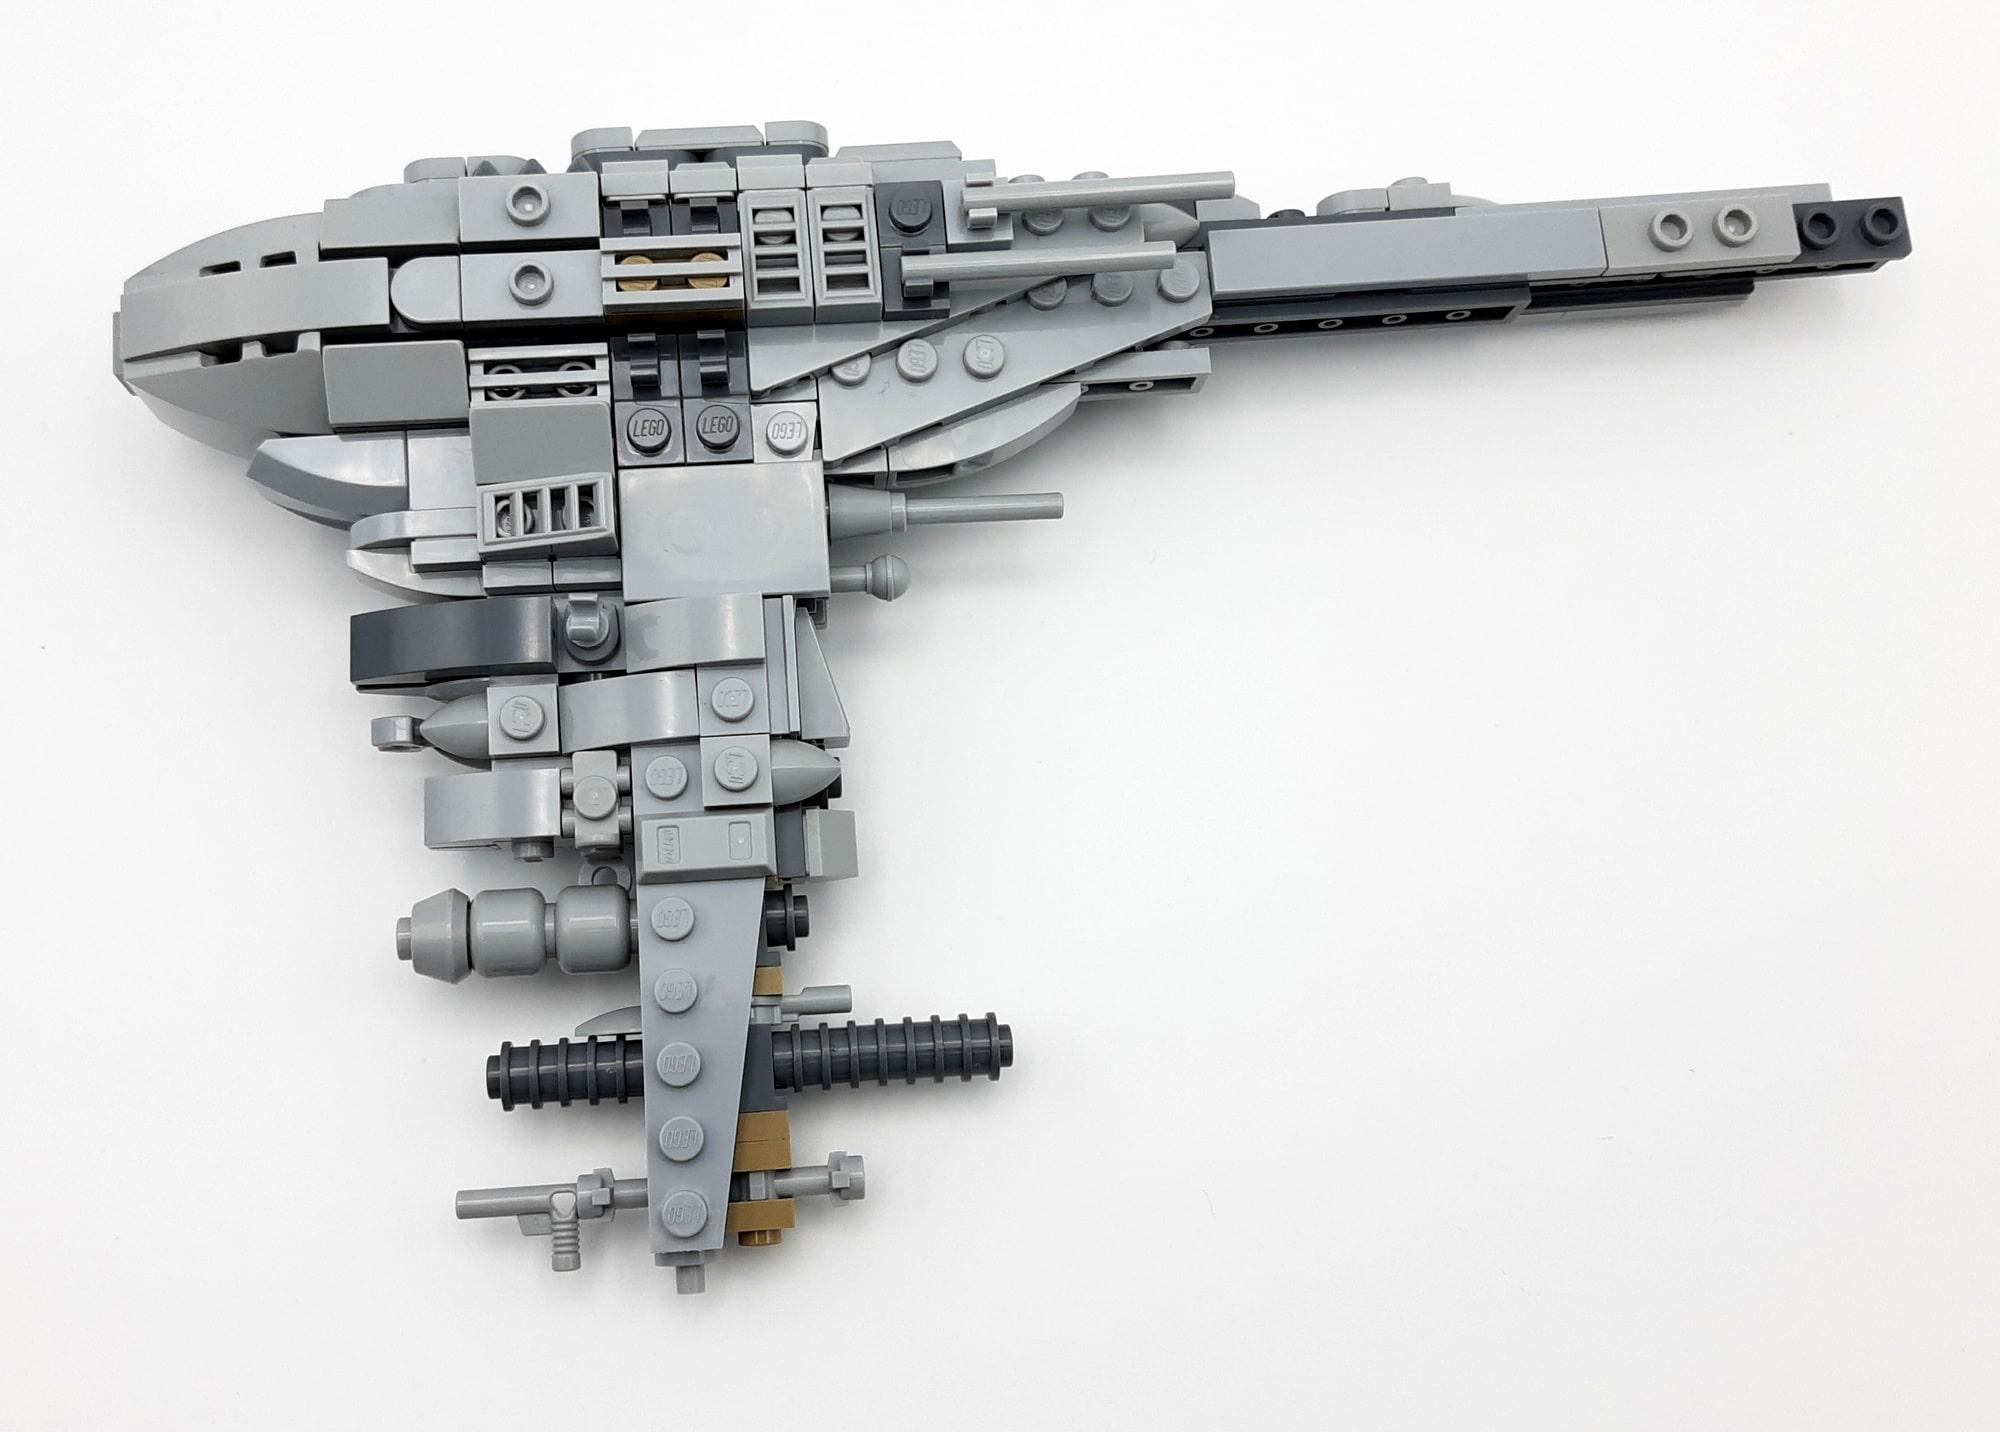 LEGO 77904 Nebulon B - Bauabschnitt 1